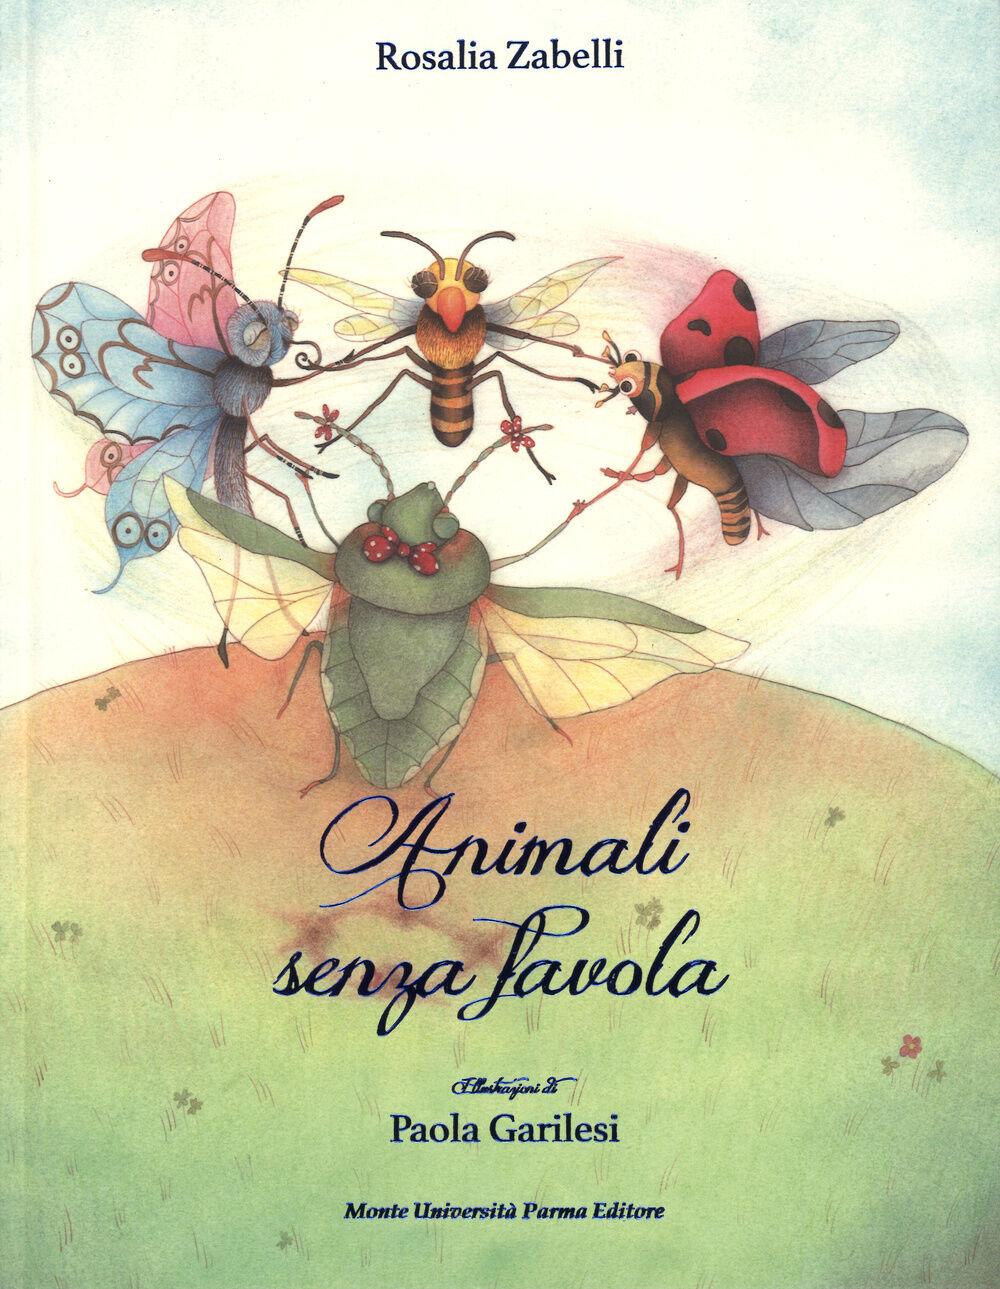 Animali senza favola